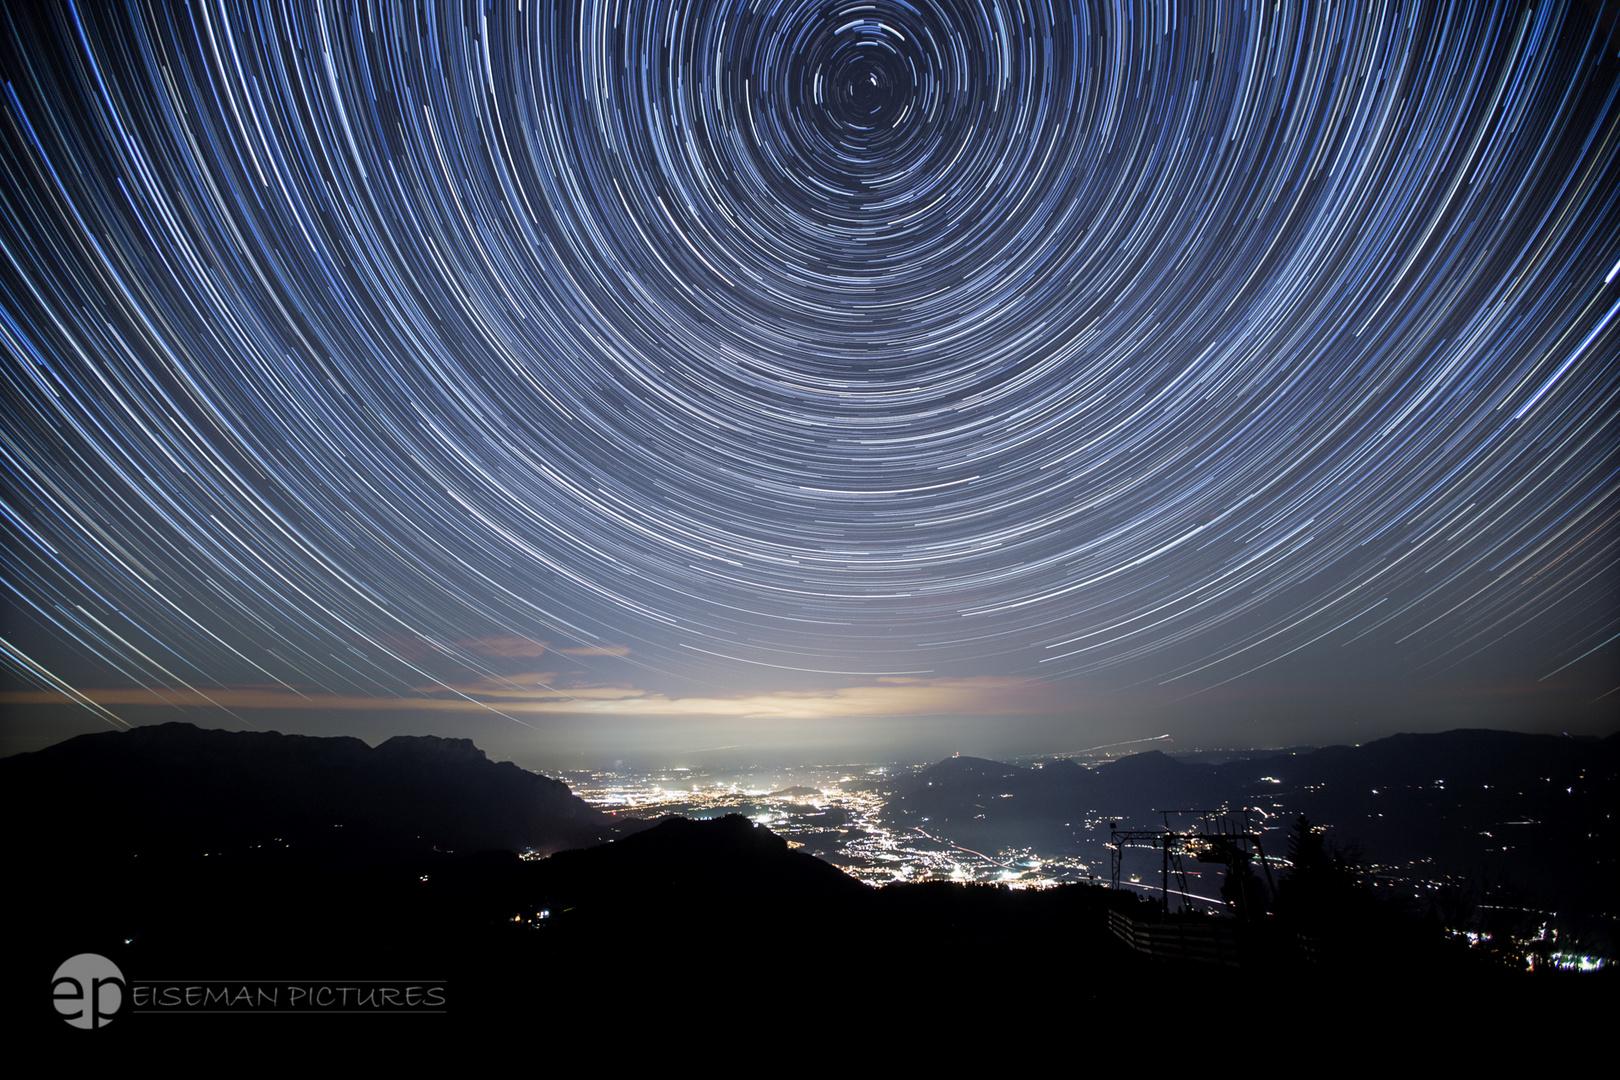 The stars over Berchtesgaden